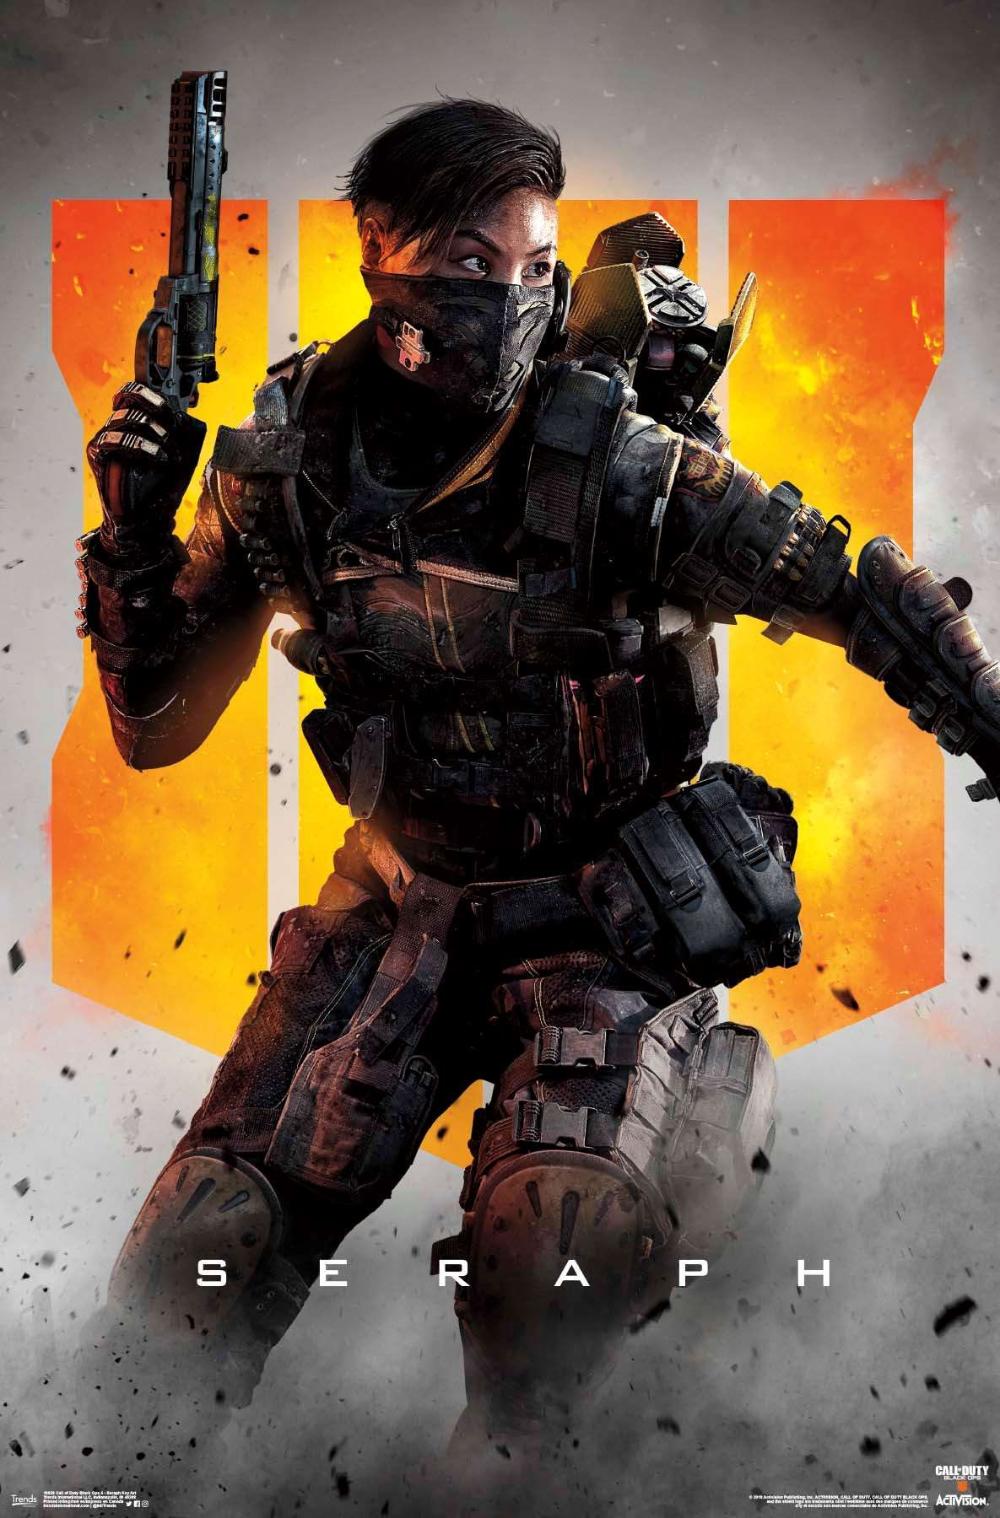 Call Of Duty Black Ops 4 Seraph Key Art Fondos De Pantalla De Juegos Fondos De Pantalla Juegos Fondo De Pantalla De Iron Man